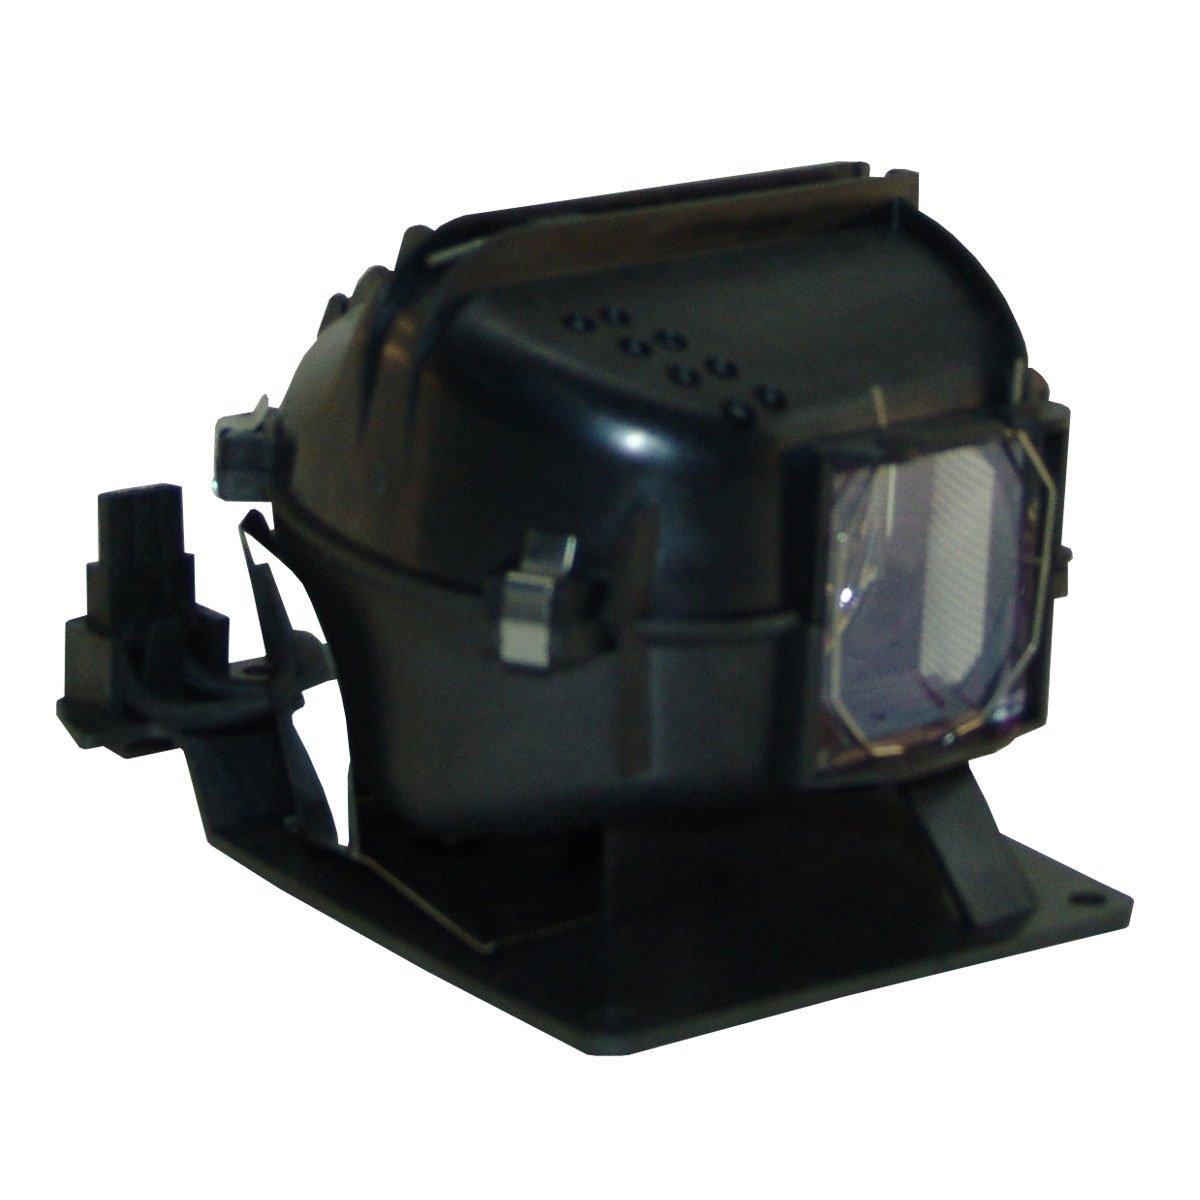 SP-LAMP-003 SPLAMP003 for Infocus M2 LP70 LP70+ DP1000X Projector Lamp Bulb With housing crystalart любовь в сердцах л 003 craл 003